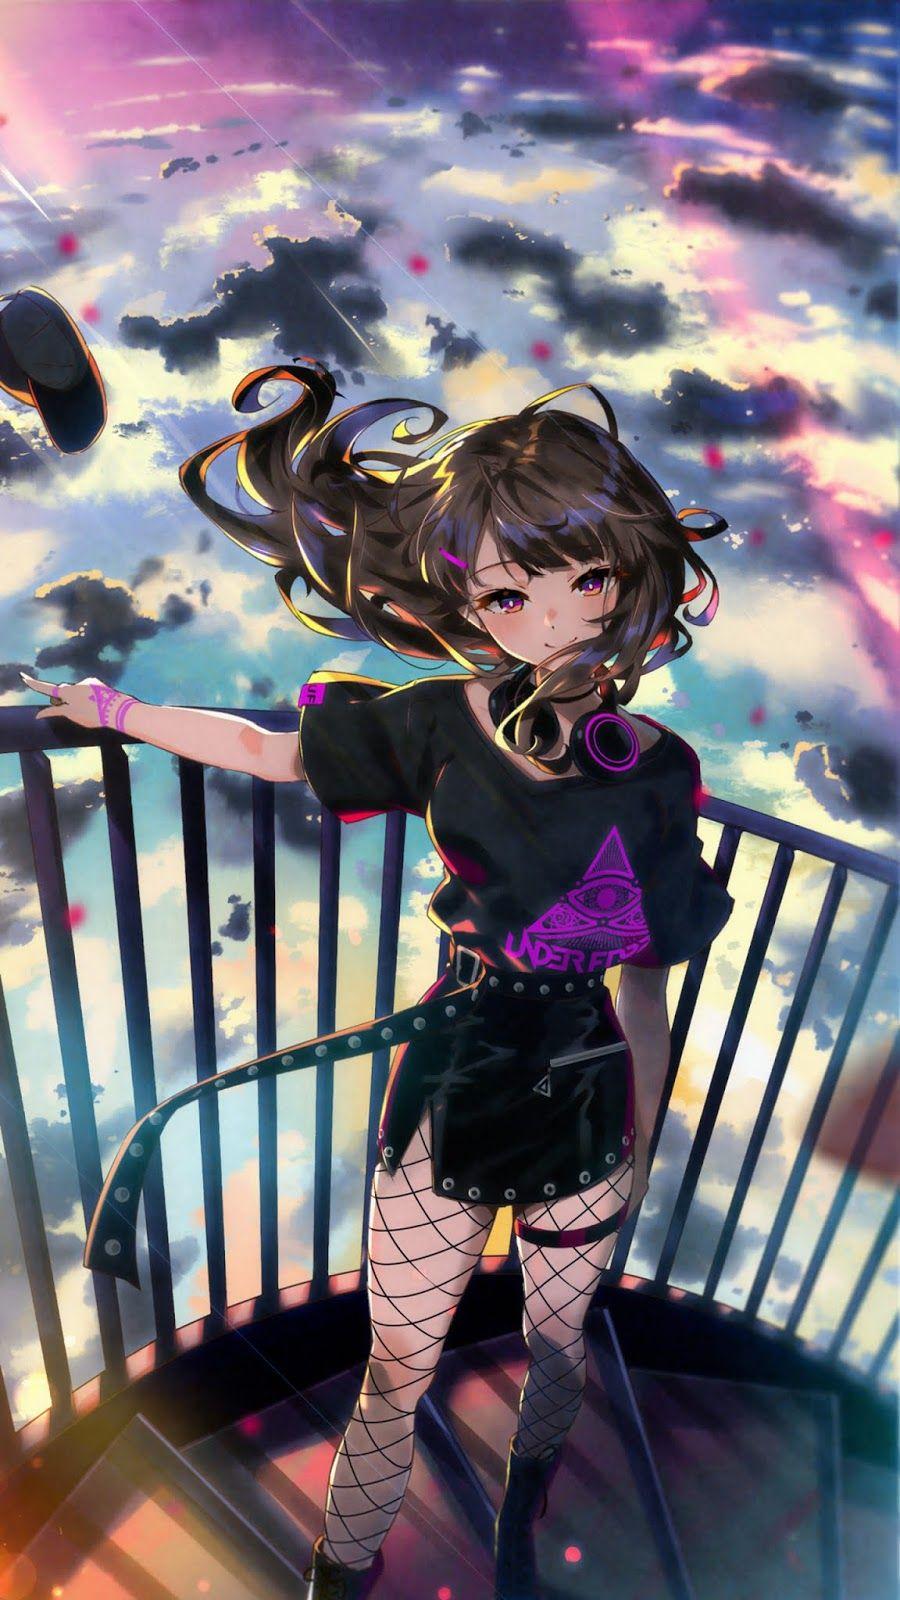 Sweet Magic: Wallpapers 4k para Celular: Animes e